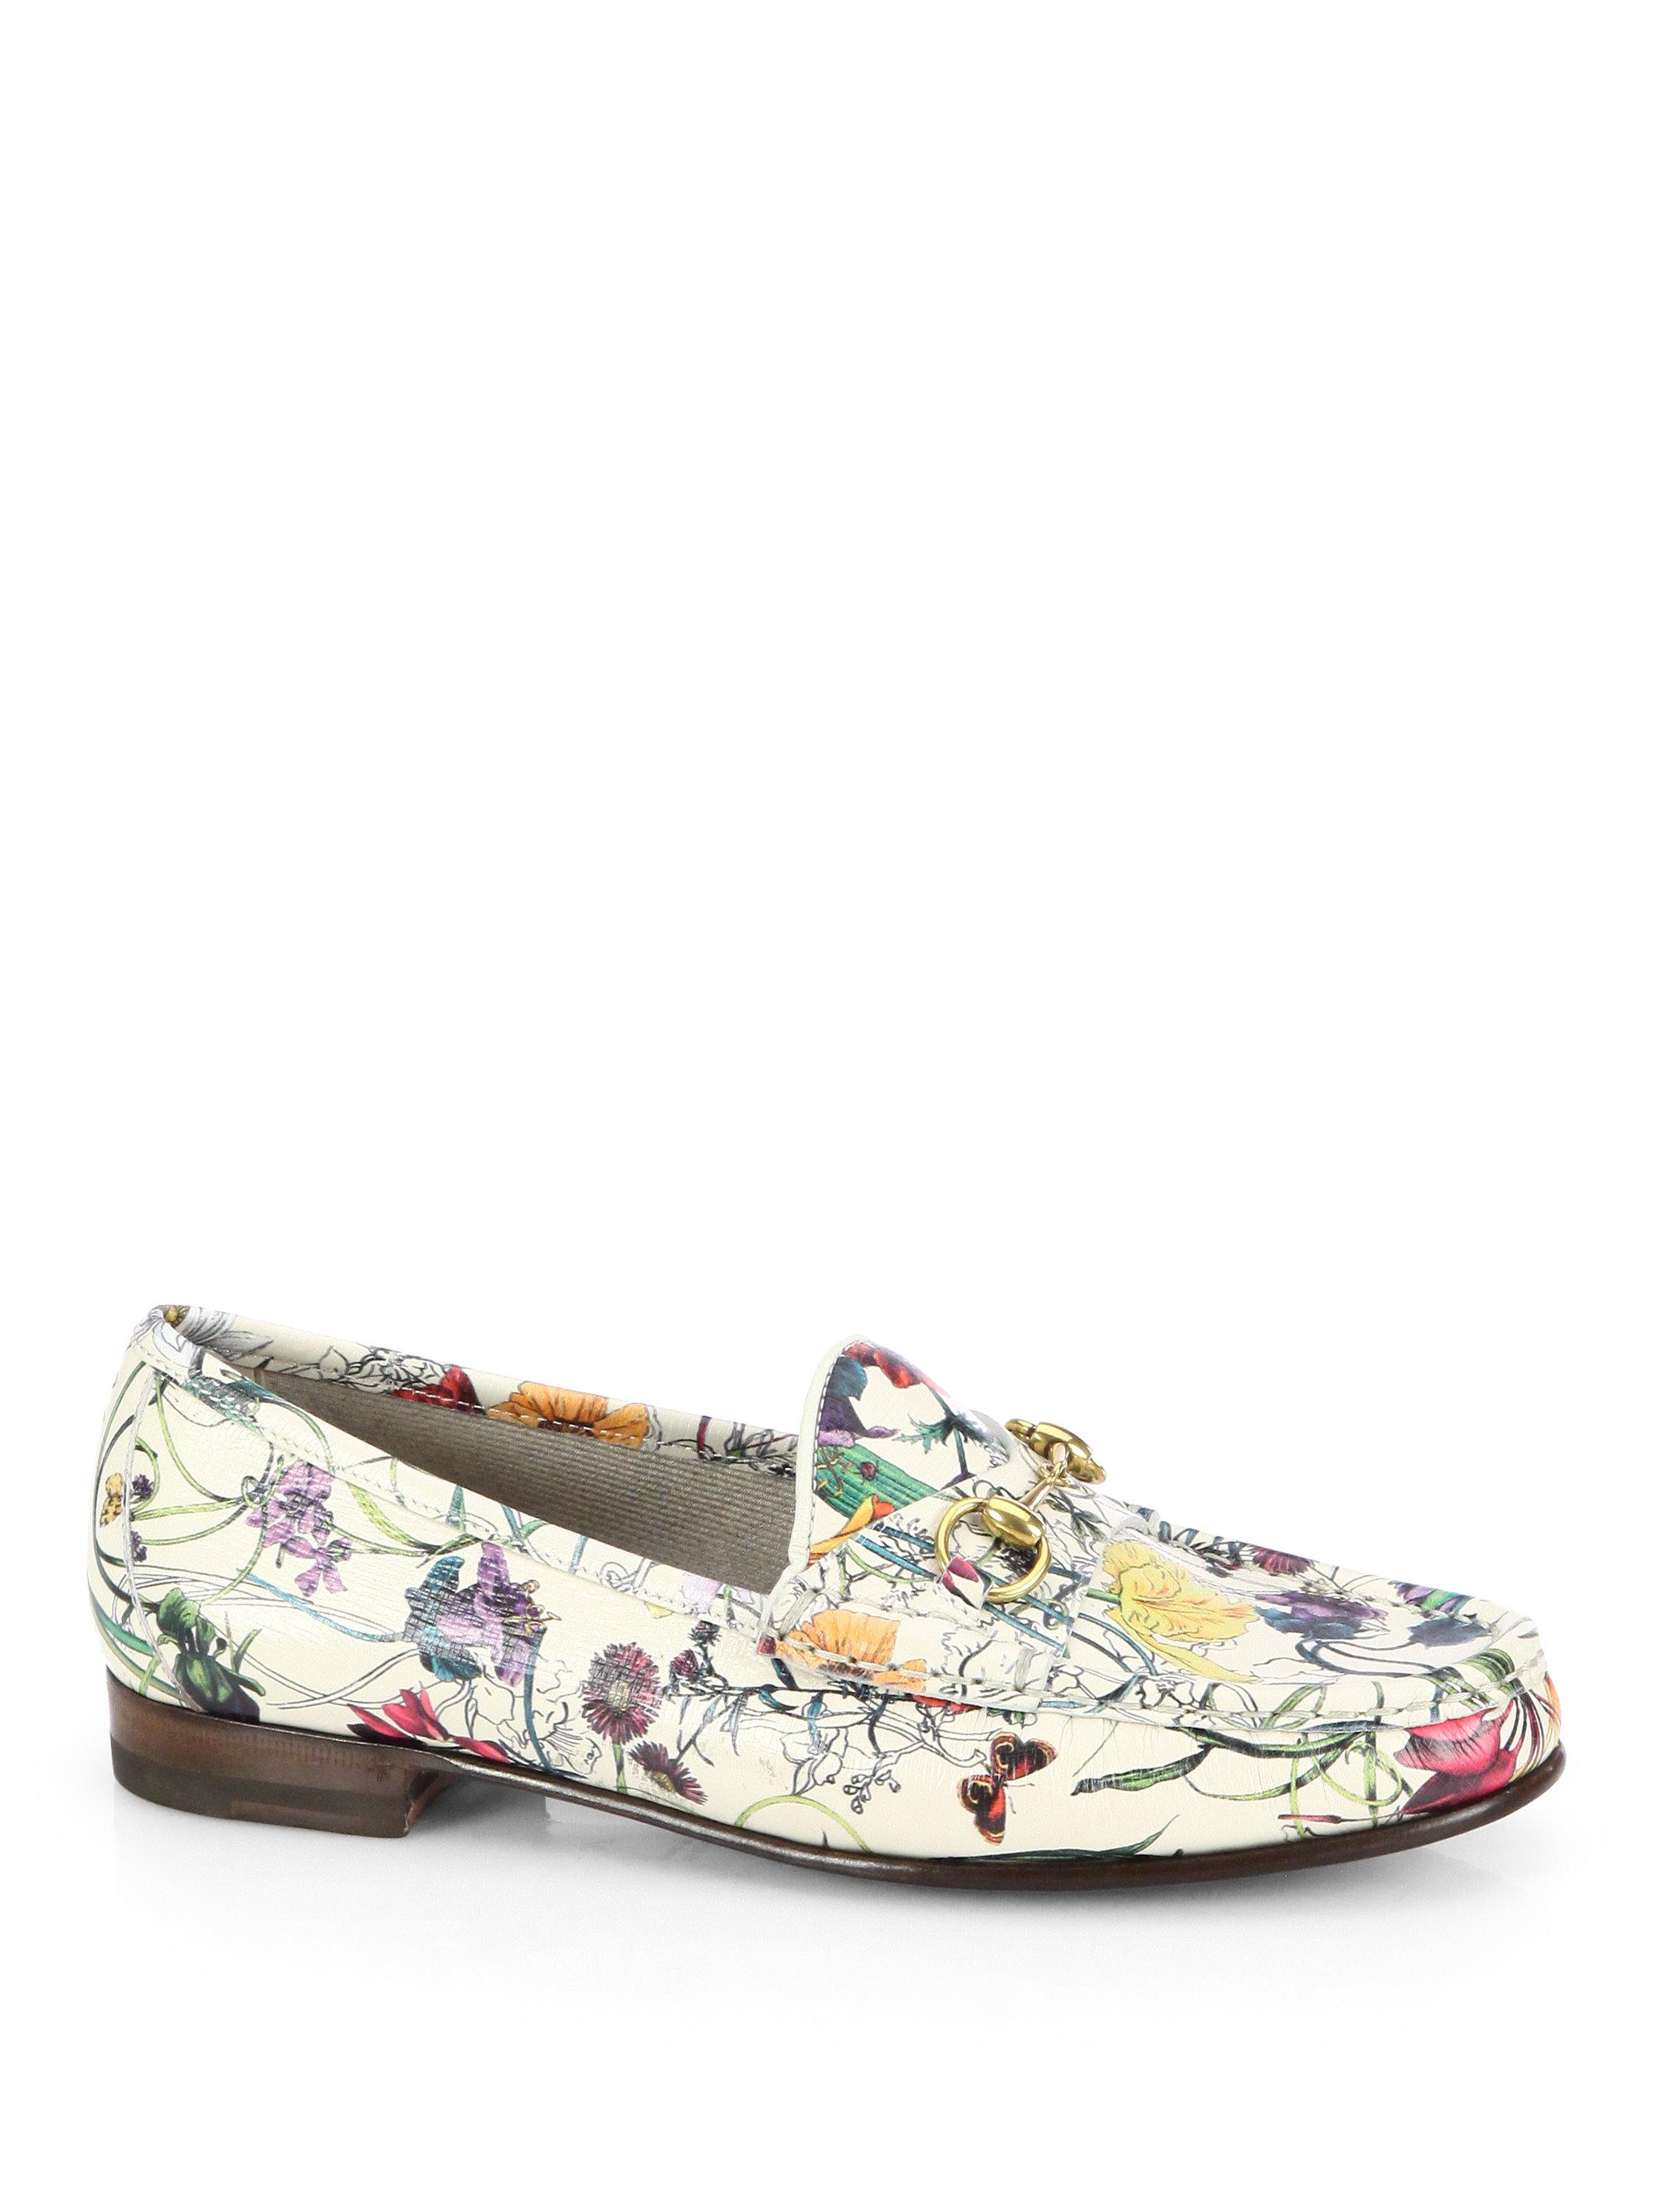 3e1e085e967 Lyst - Gucci Floral print Leather Moccasin Loafers